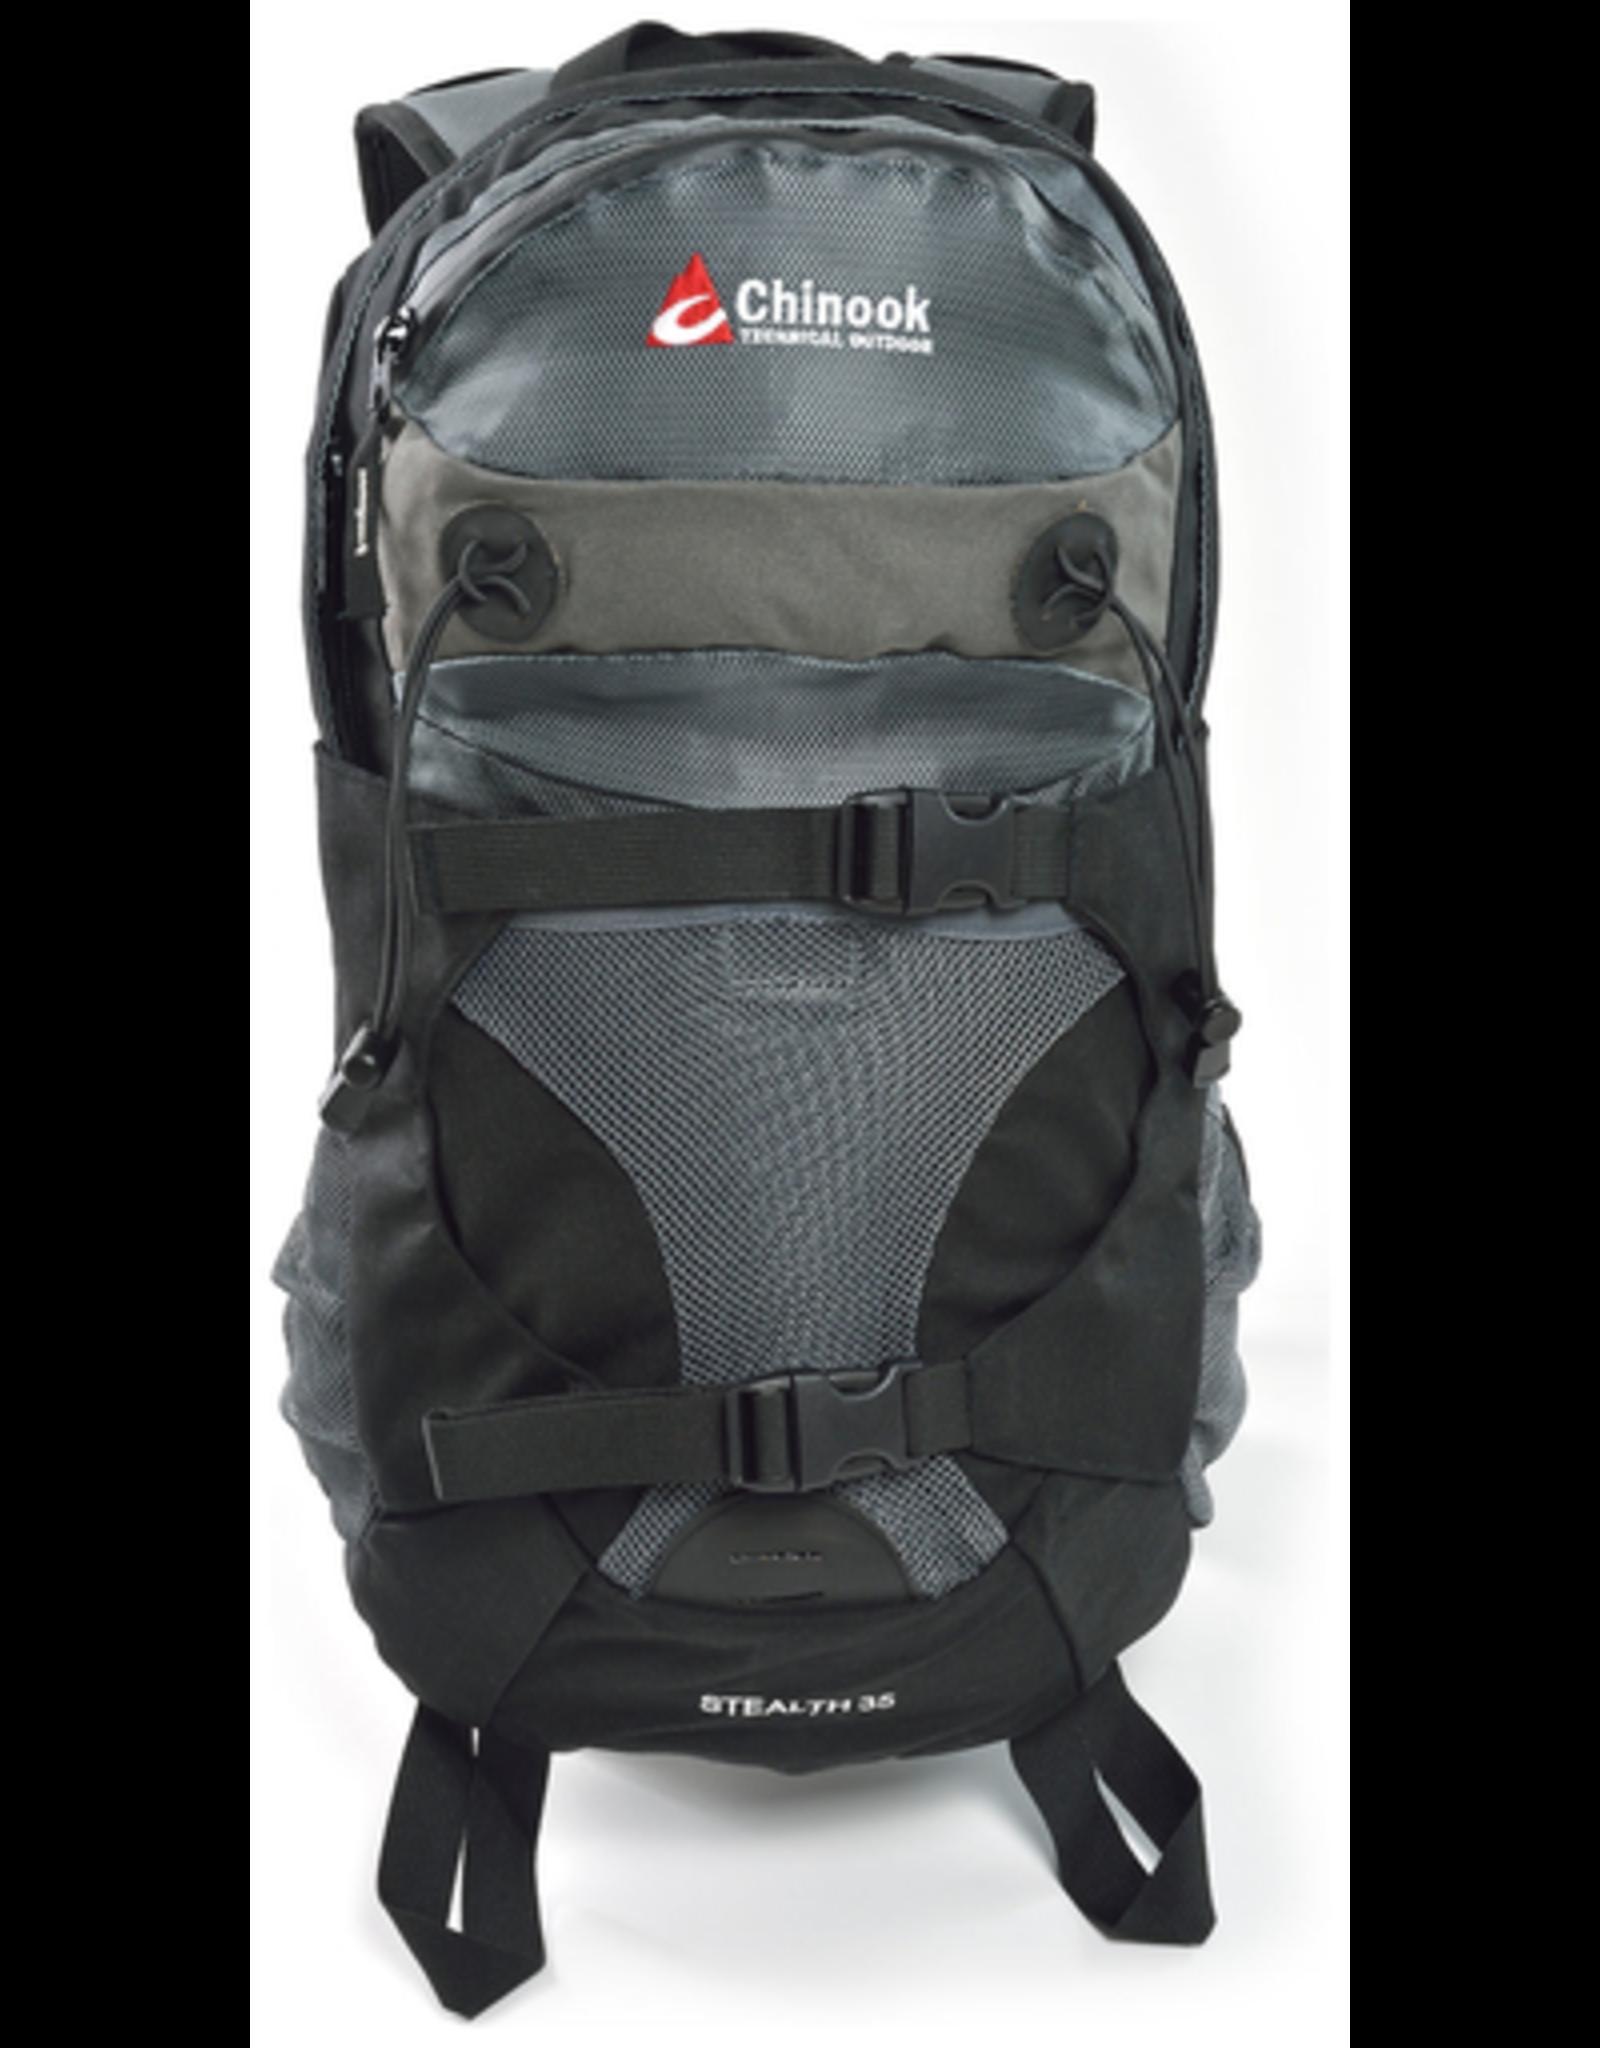 Chinook Chinook Stealth 35 (Black)